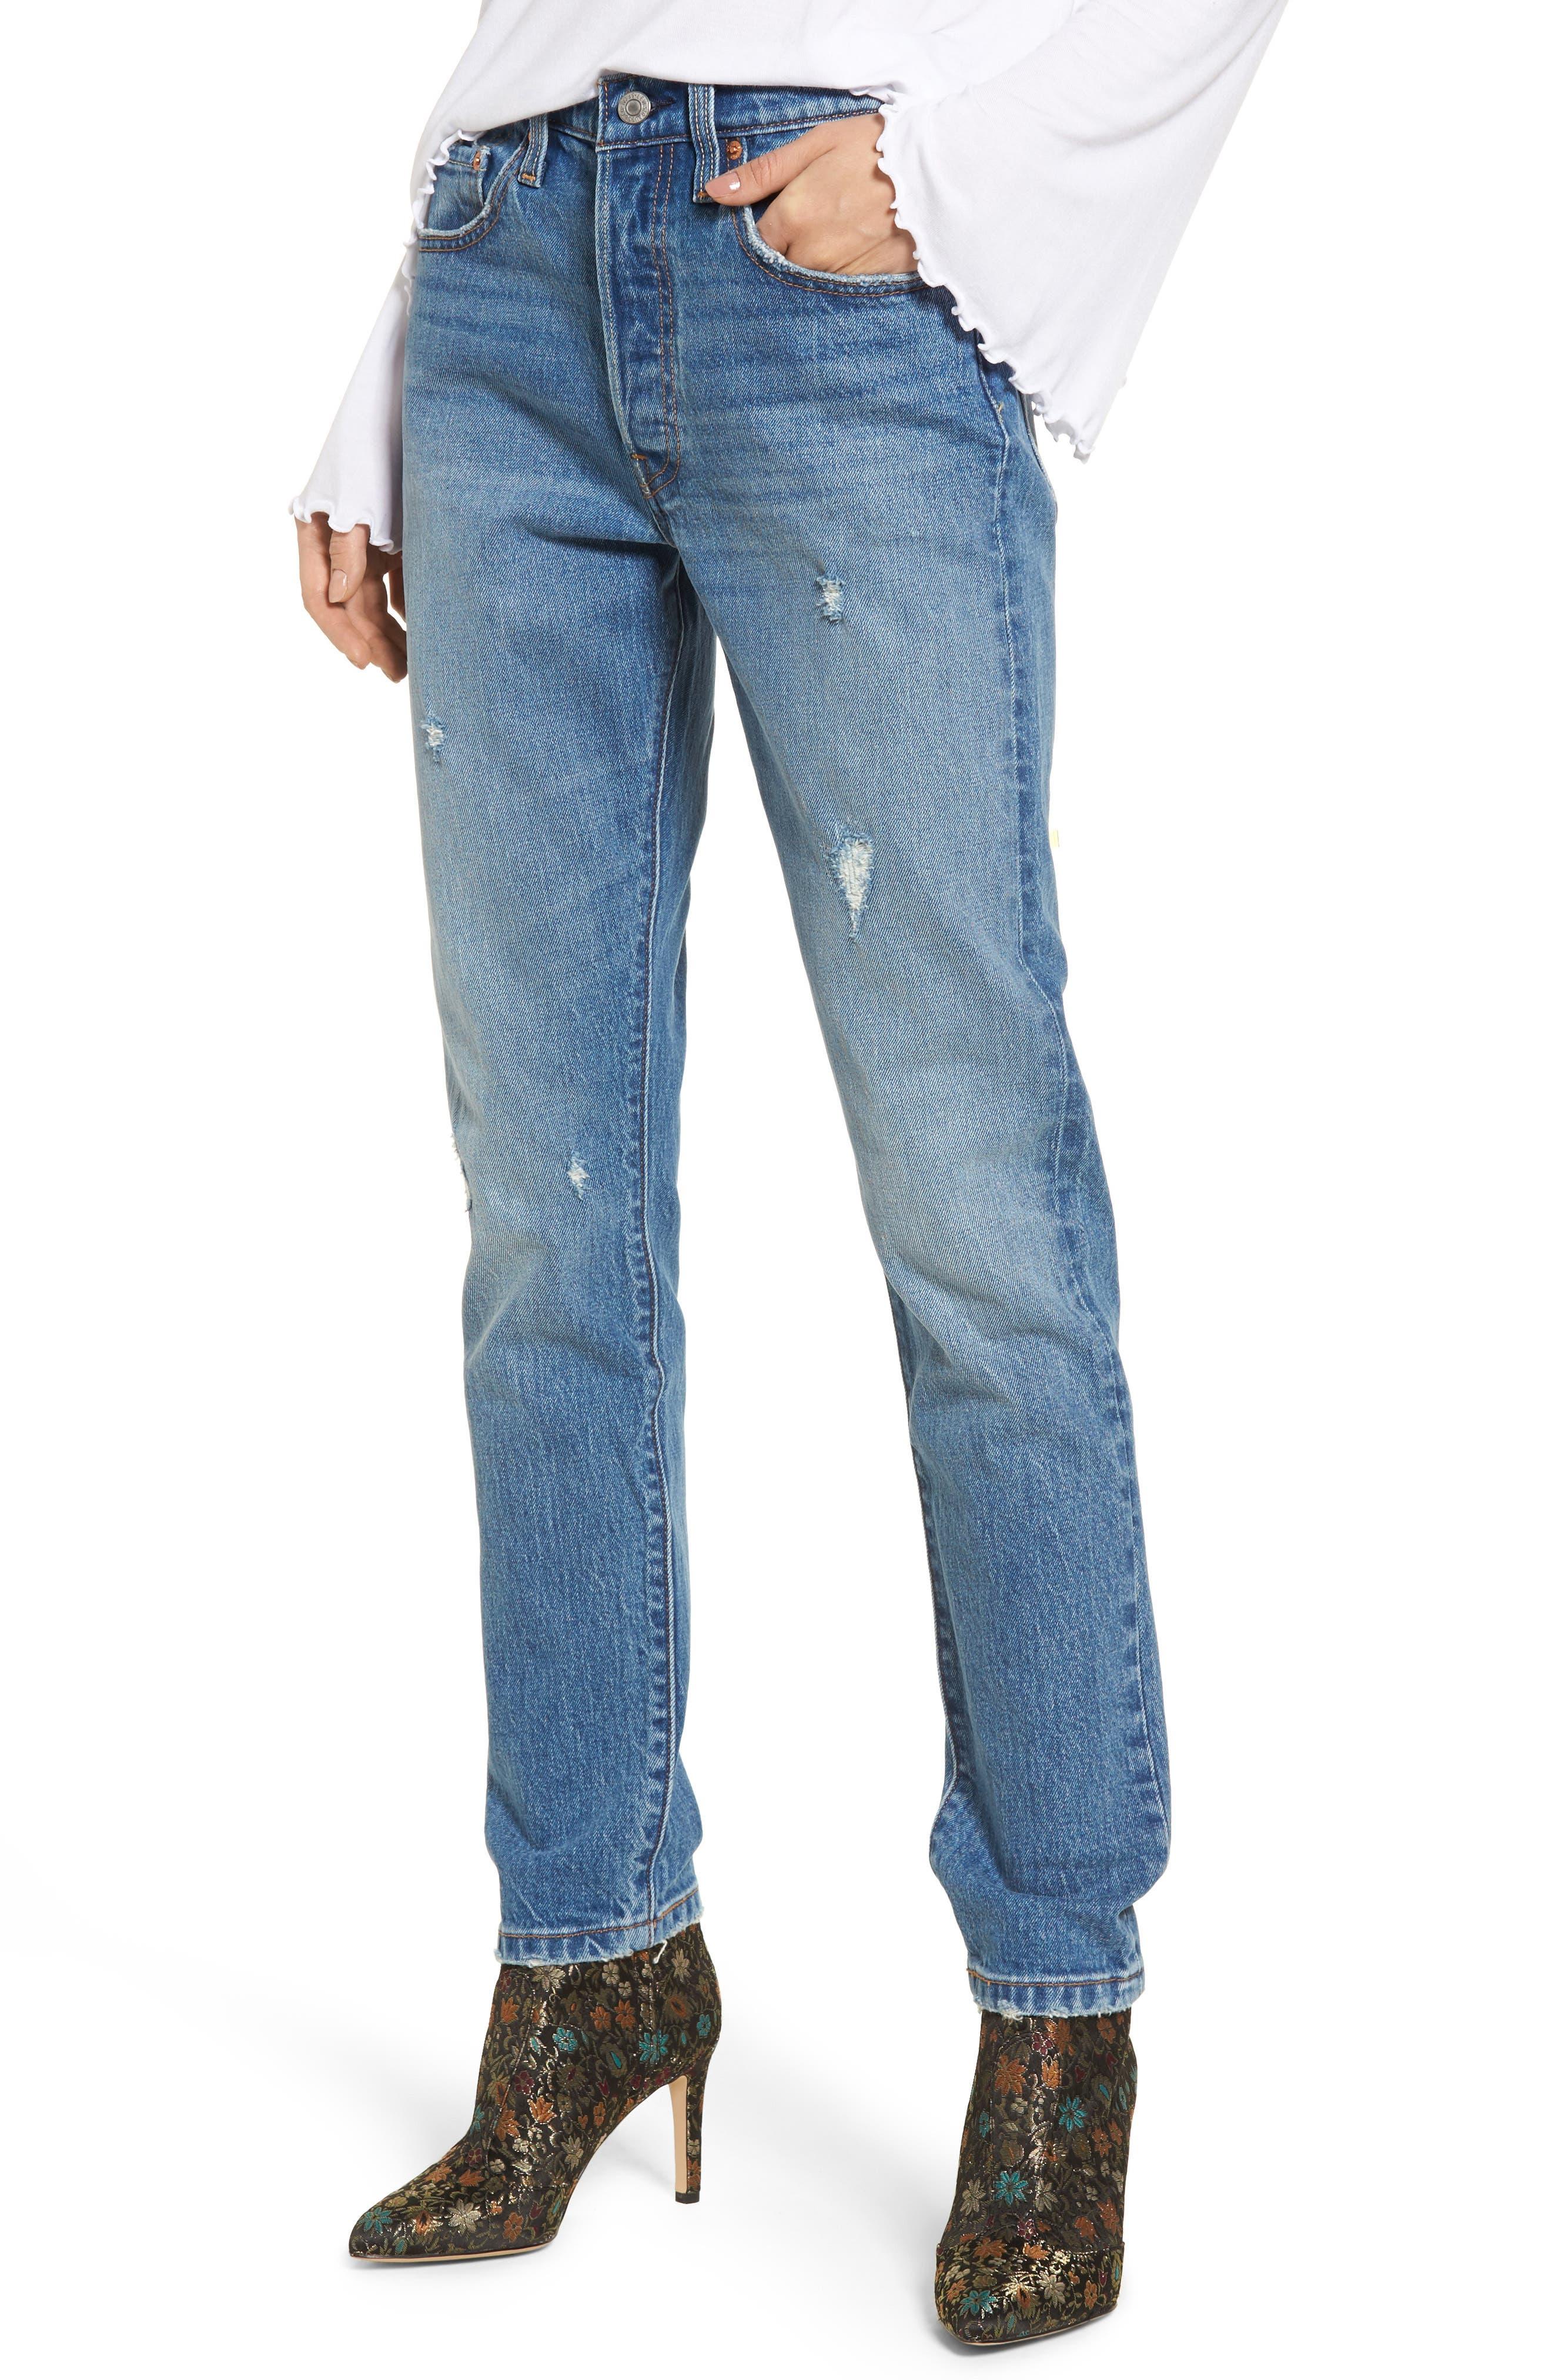 Main Image - Levi's® 501 High Waist Skinny Jeans (Leave a Trace)